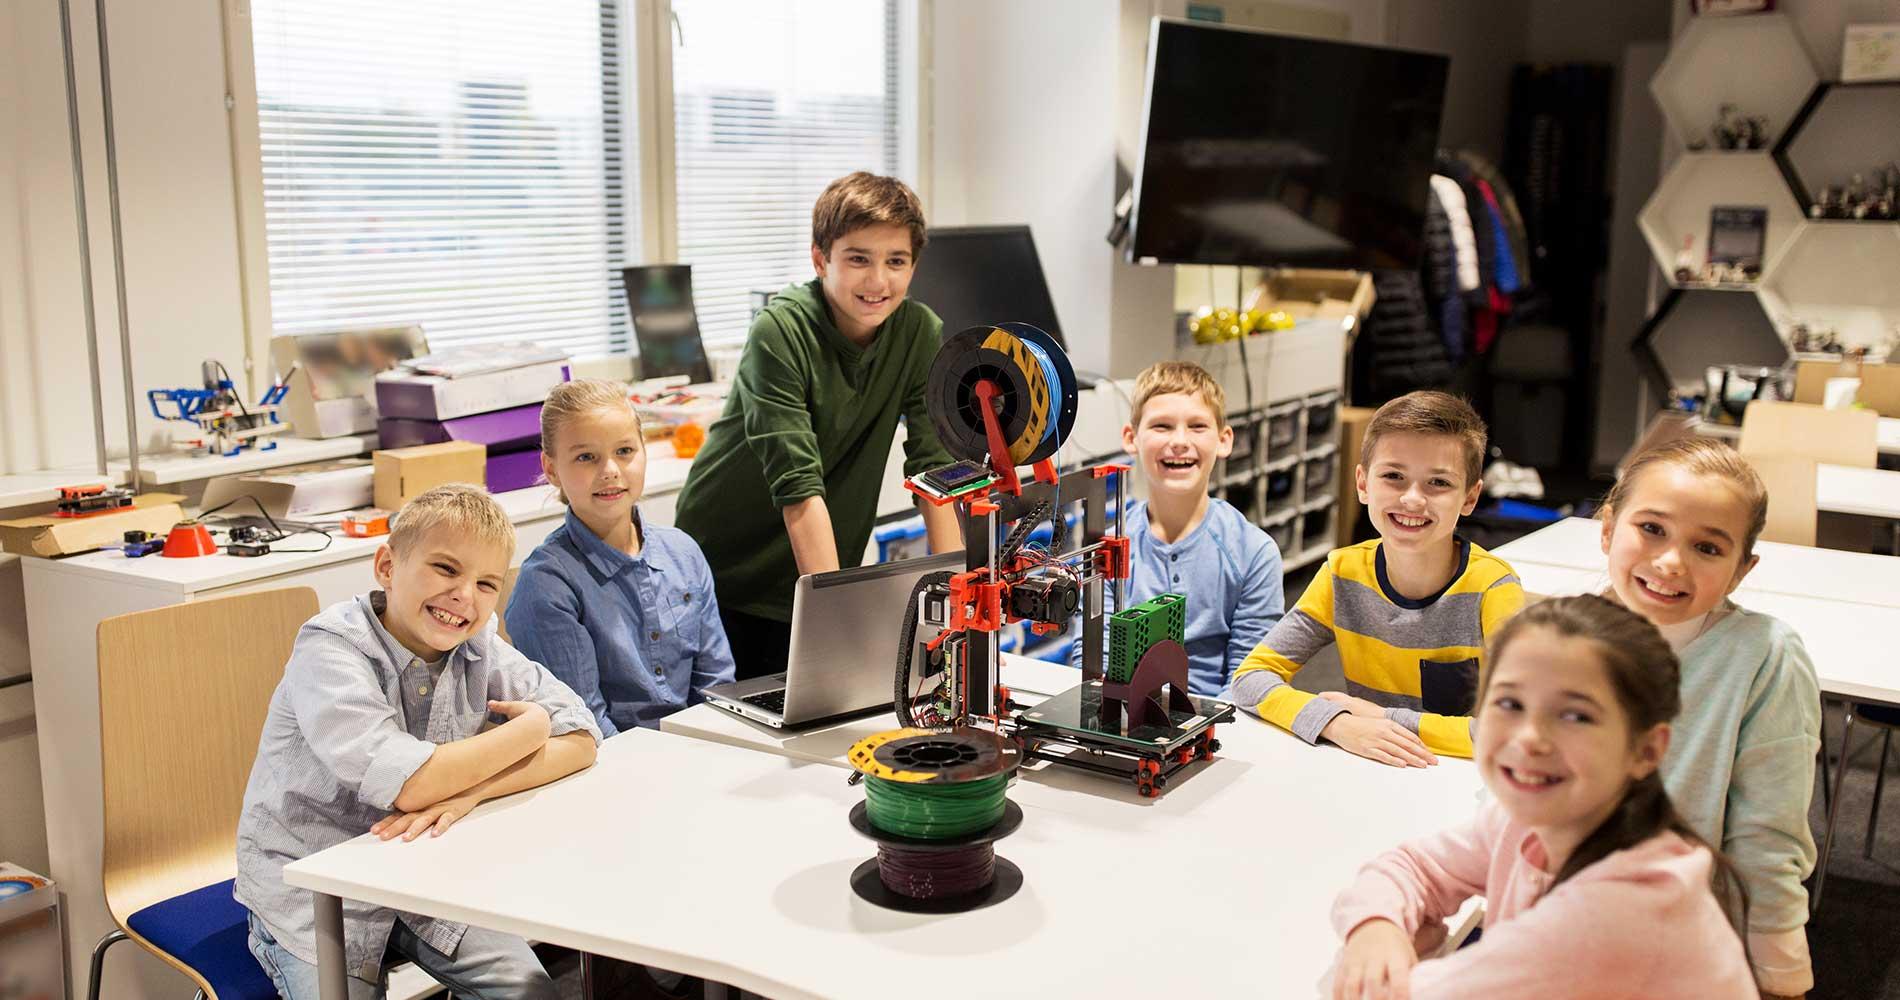 10 Technology Developments that Transformed Learning